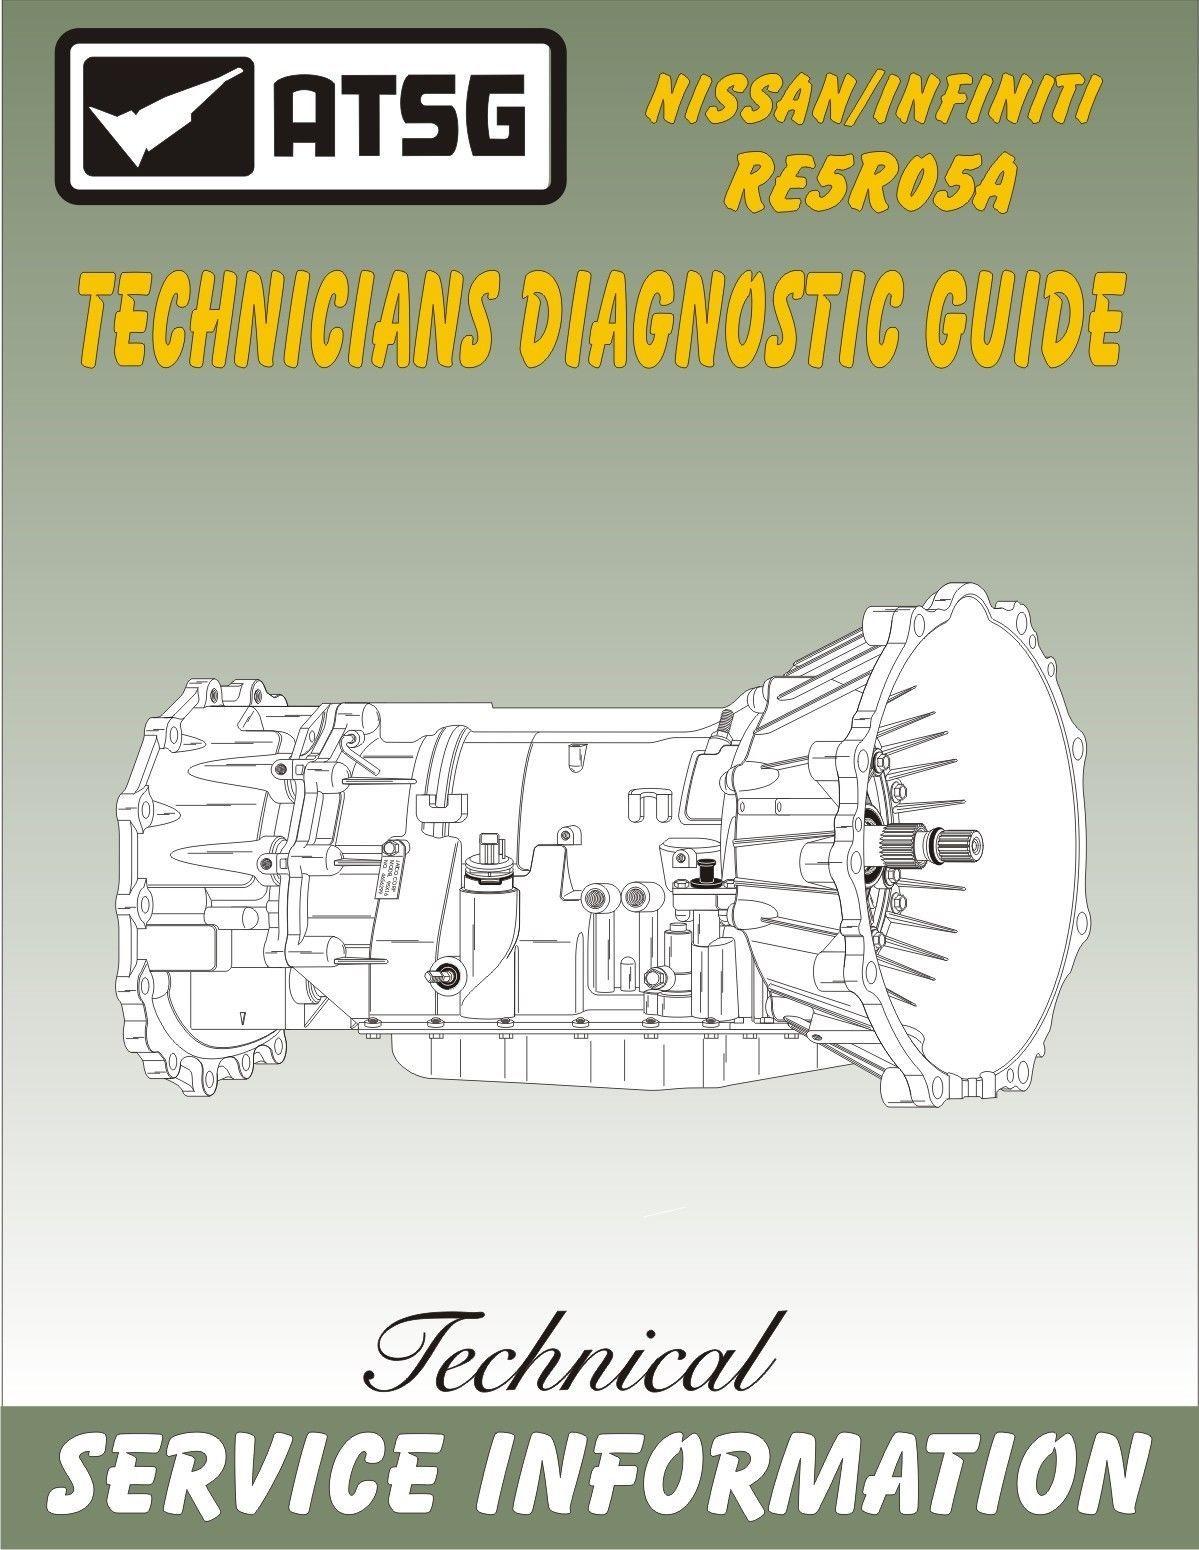 NISSAN-INFINITI-TRANSMISSION RE5R05A Technicians Diagnostic Guide-SERVICE  MANUAL